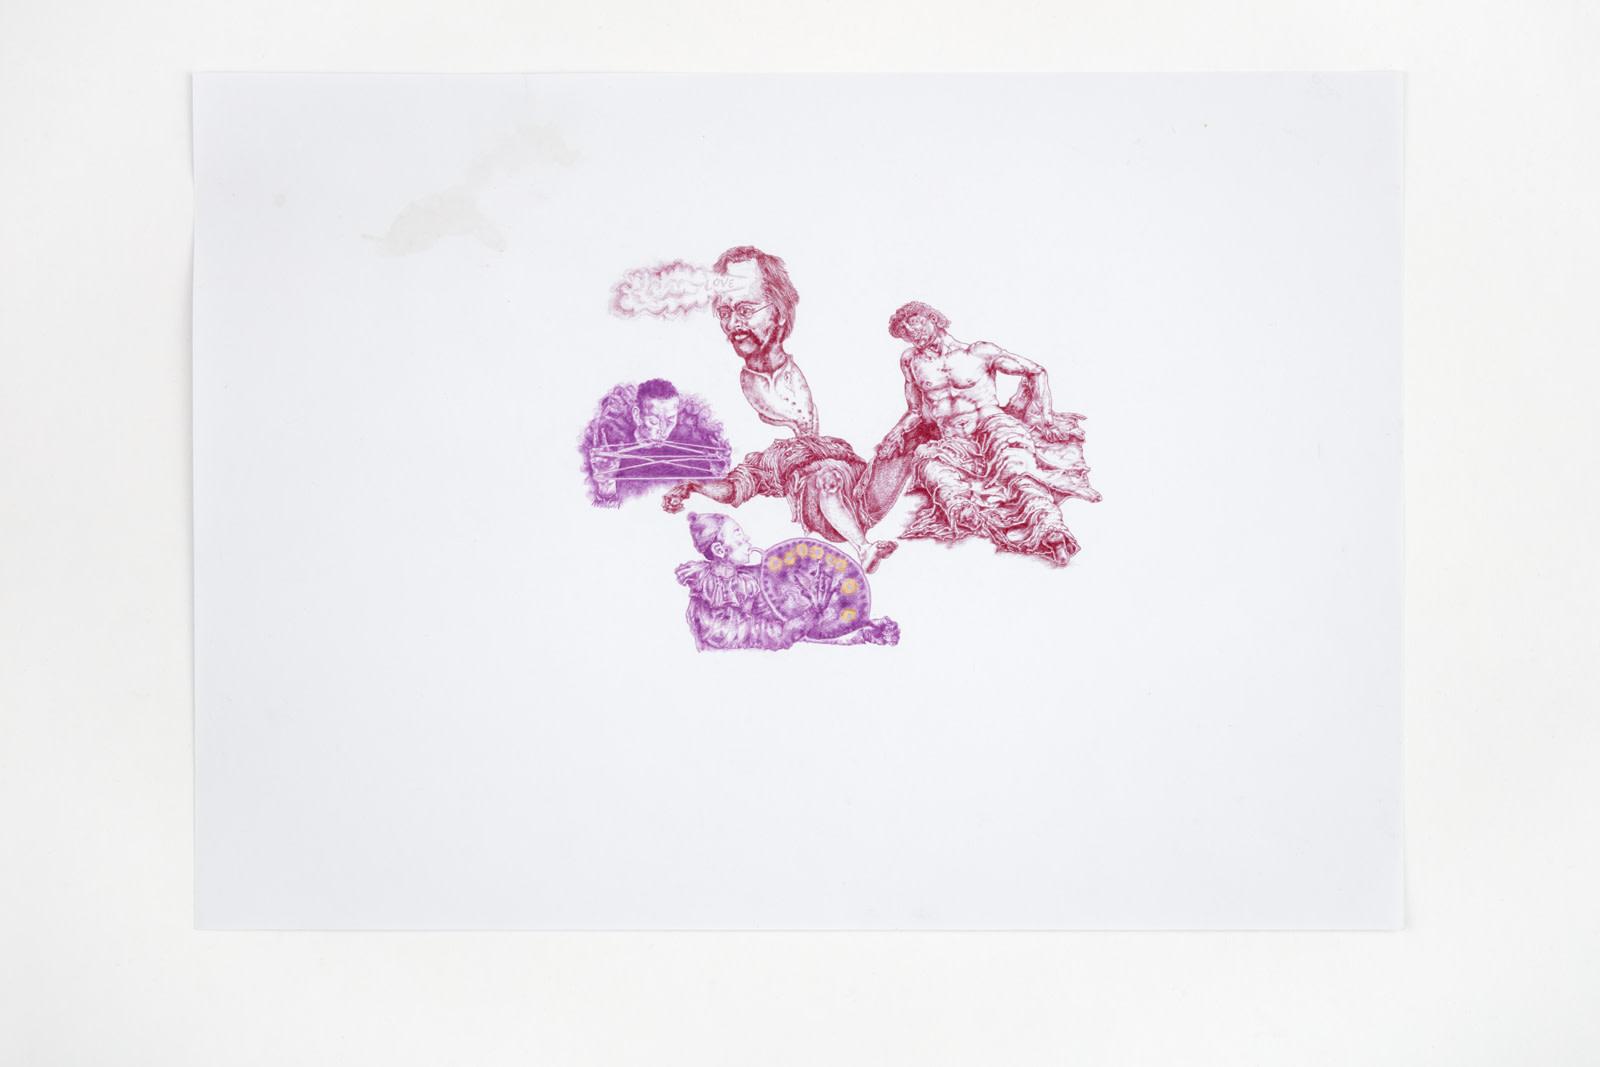 "<div class=""artwork_caption""><div class=""title""><em>Untitled</em>, 2020</div><div class=""medium"">coloured pencil on paper</div><div class=""dimensions"">site size: 30.4 x 45.4 cm / 12 x 17 ⅞ in<br />frame size: 34.1 x 46.4 x 2.5 cm / 13 ⅜ x 18 ¼ x 1 in</div></div><div class=""link""><span class=""website_contact_form"" data-contact-form-details=""Untitled , 2020  coloured pencil on paper  site size: 30.4 x 45.4 cm / 12 x 17 ⅞ in frame size: 34.1 x 46.4 x 2.5 cm / 13 ⅜ x 18 ¼ x 1 in"" data-contact-form-image=""https://artlogic-res.cloudinary.com/w_200,h_200,c_fill,f_auto,fl_lossy/ws-sadiecoles/usr/exhibitions/images/exhibitions/829/hq24-hm16790d-untitled_unframed.jpeg"">Enquire</span></div>"